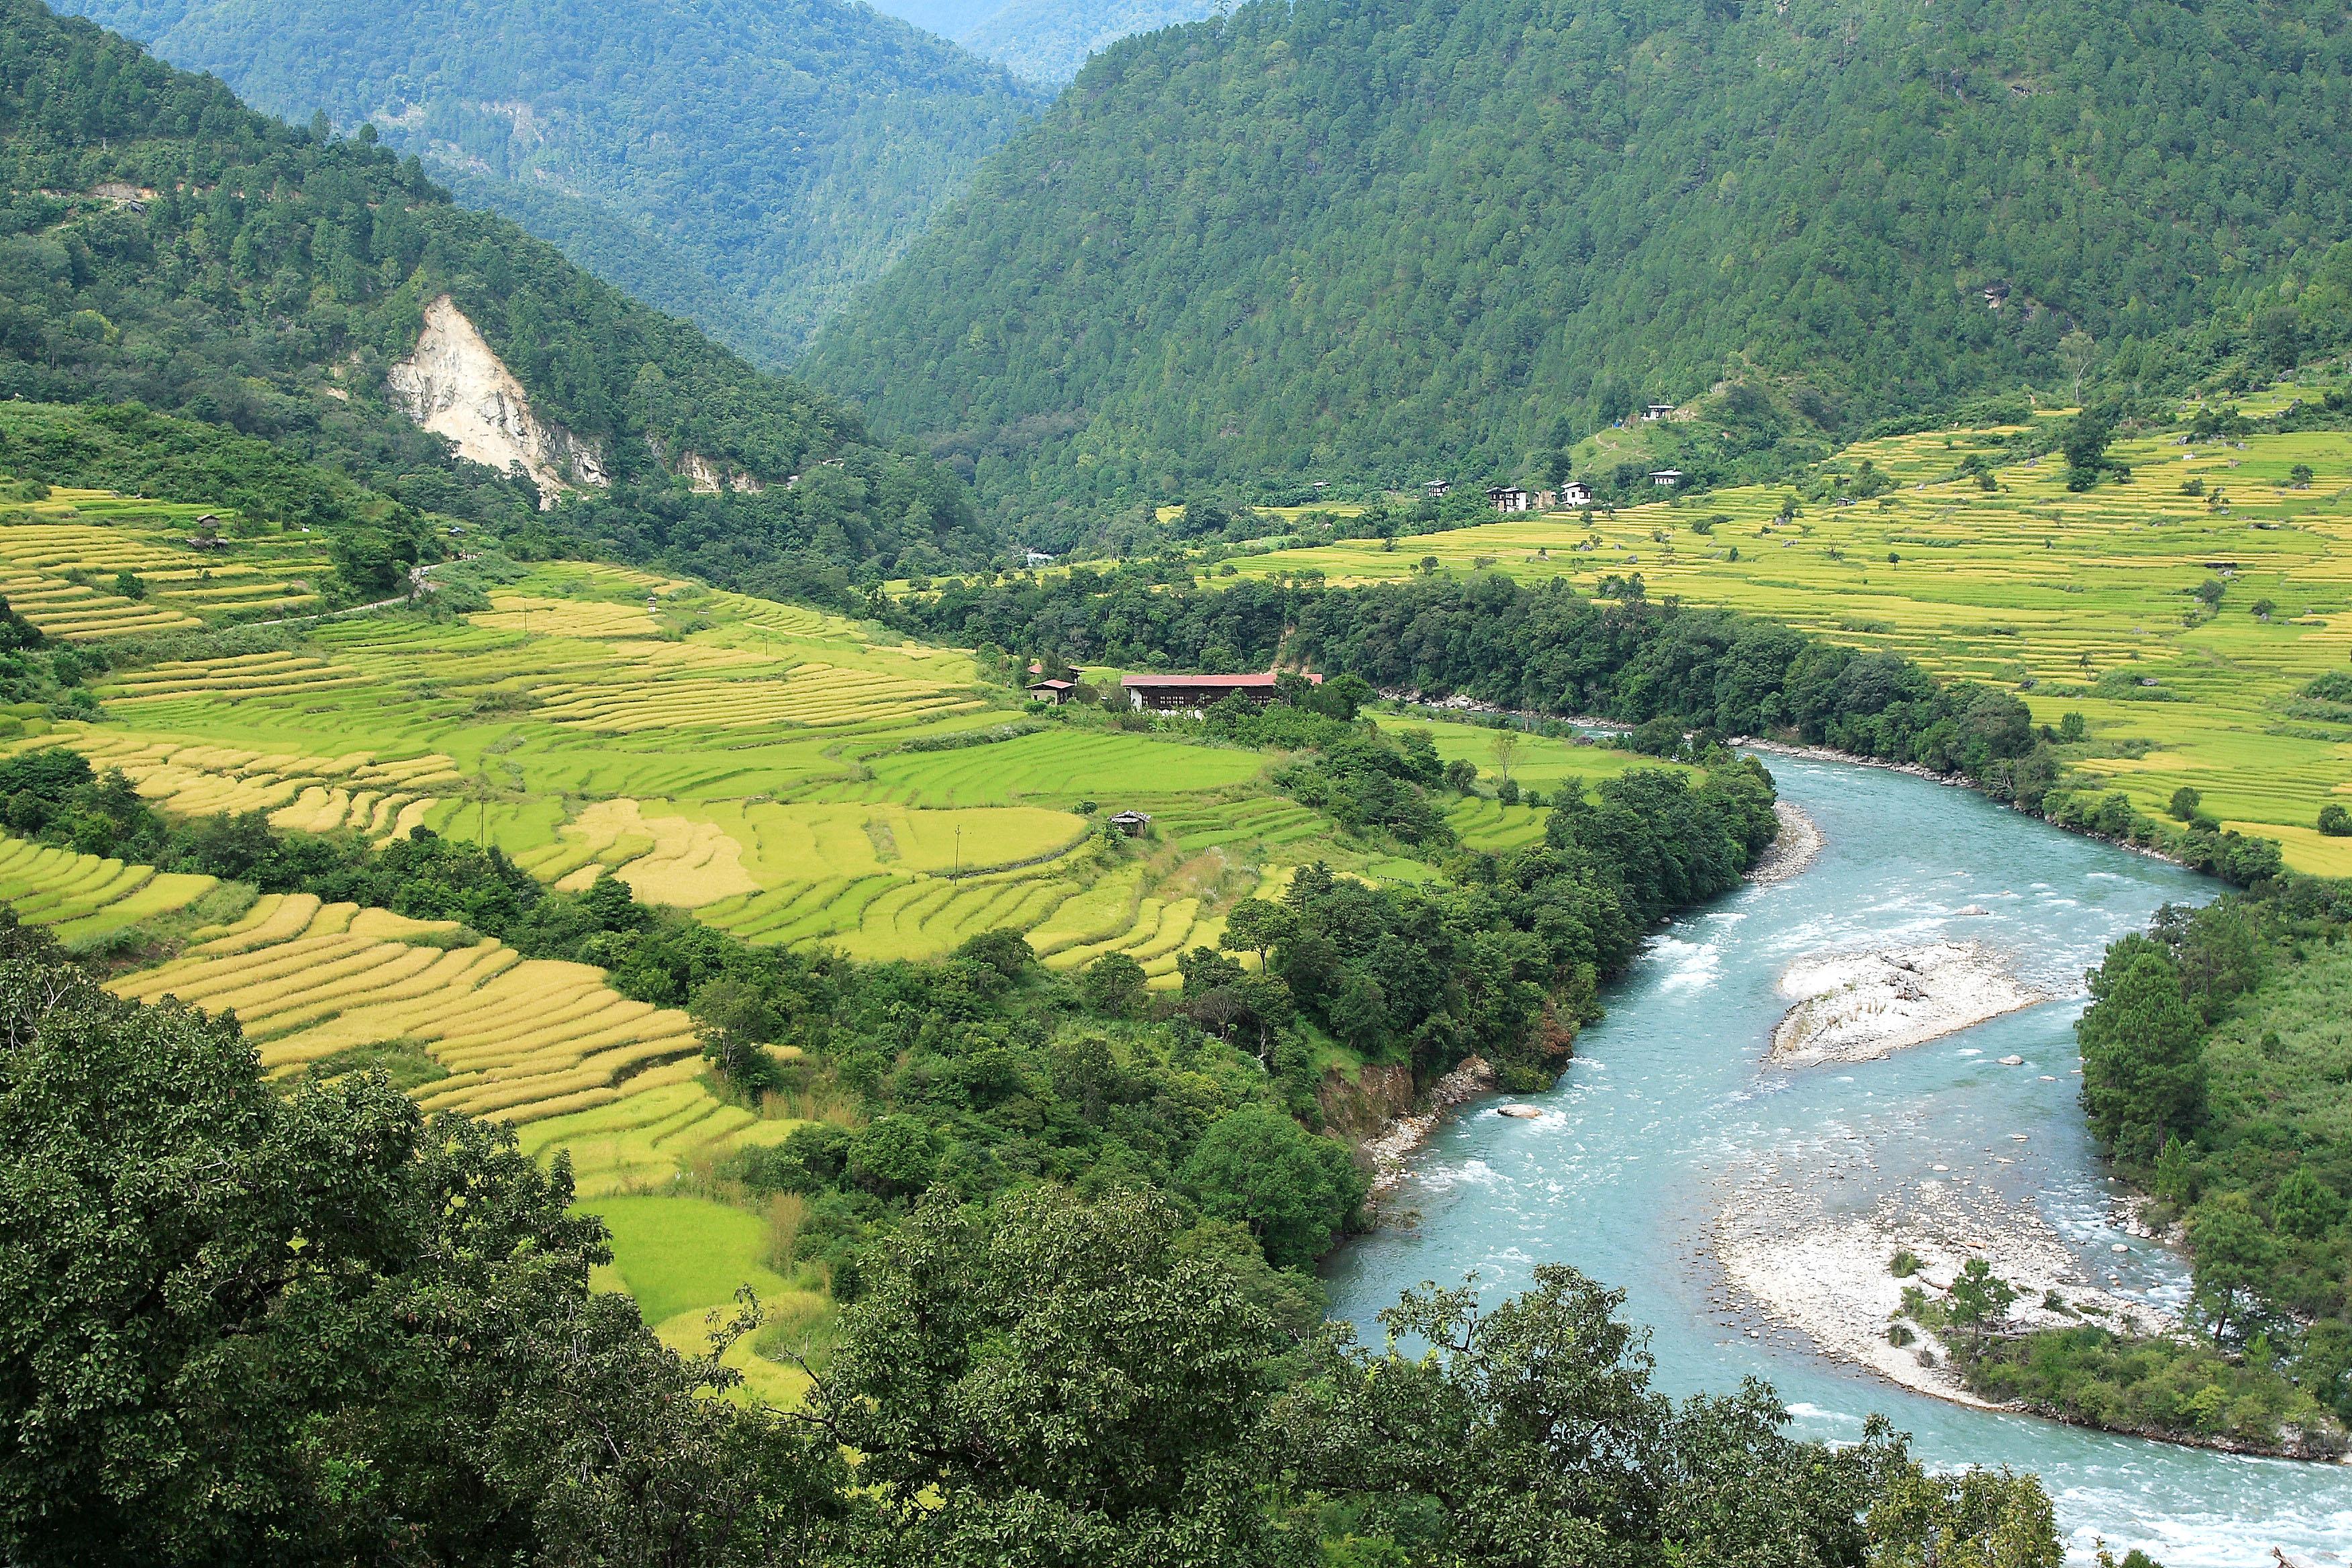 Welcome To Como S Brand New Uma Punakha Resort In Bhutan Welcome To Ampersand S Travel Blog